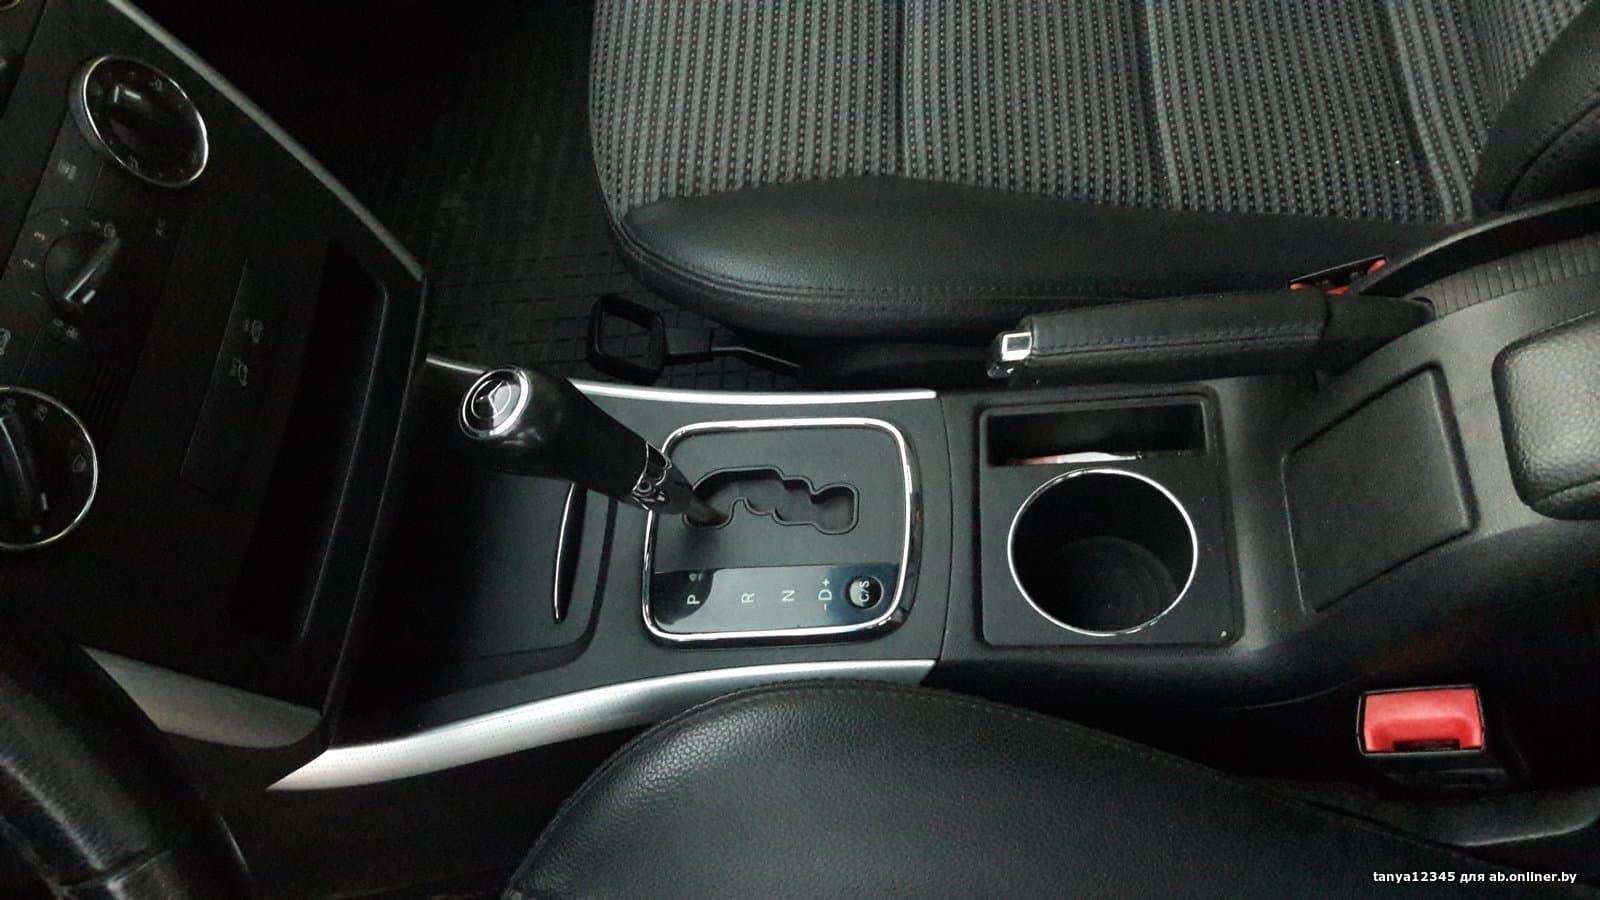 Mercedes-Benz A180 w169